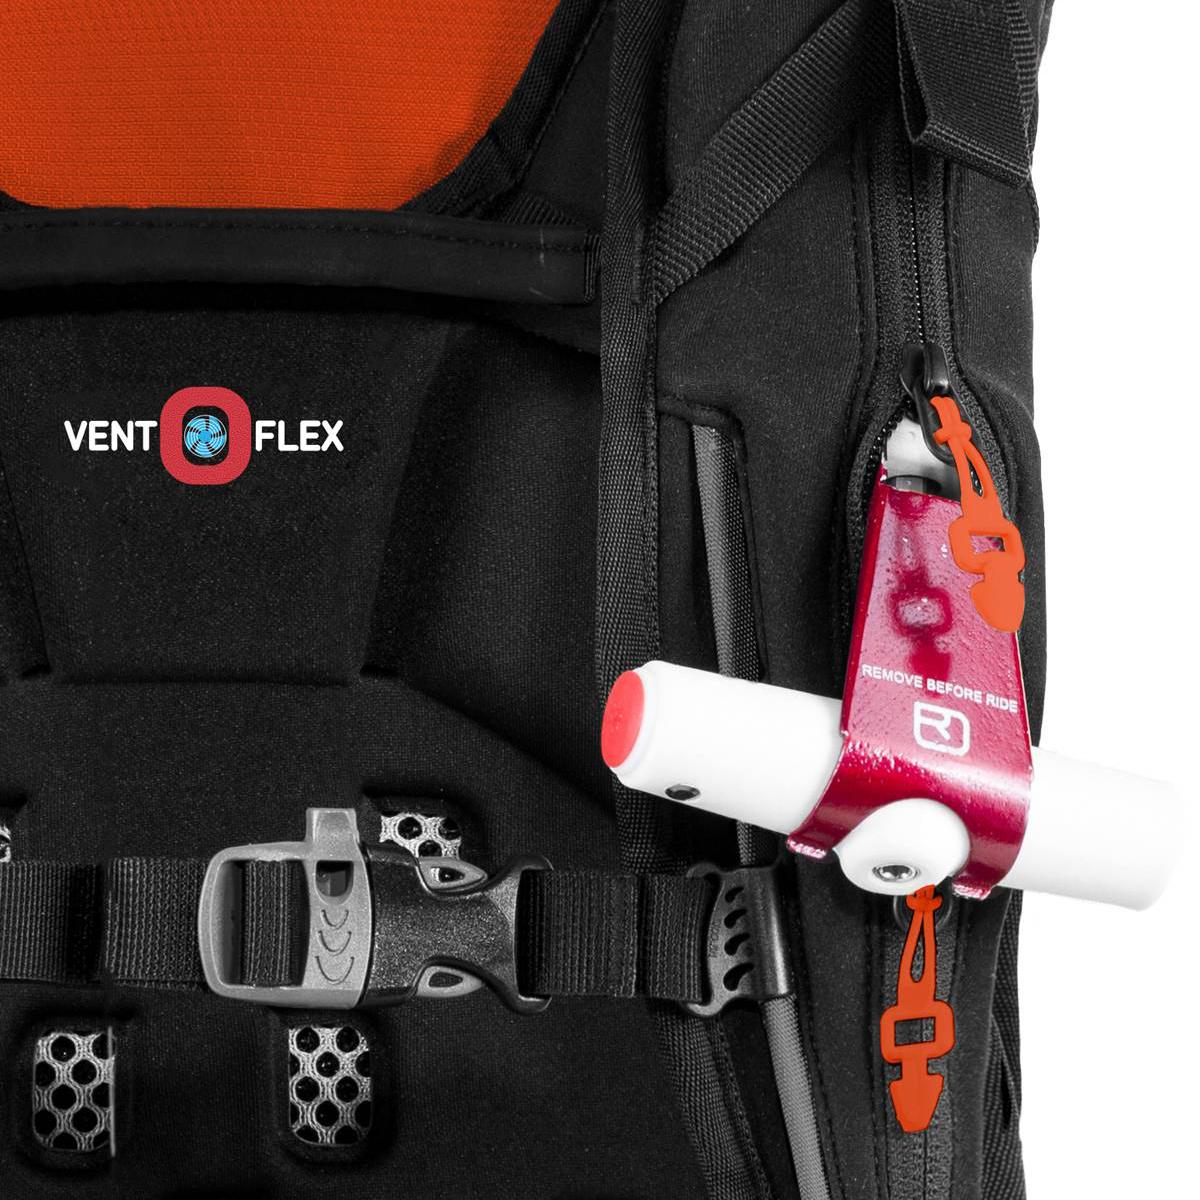 ec5b6f9f60f Ortovox Tour 32+7 ABS Avalanche Airbag Pack | Backpacks | EpicTV Shop